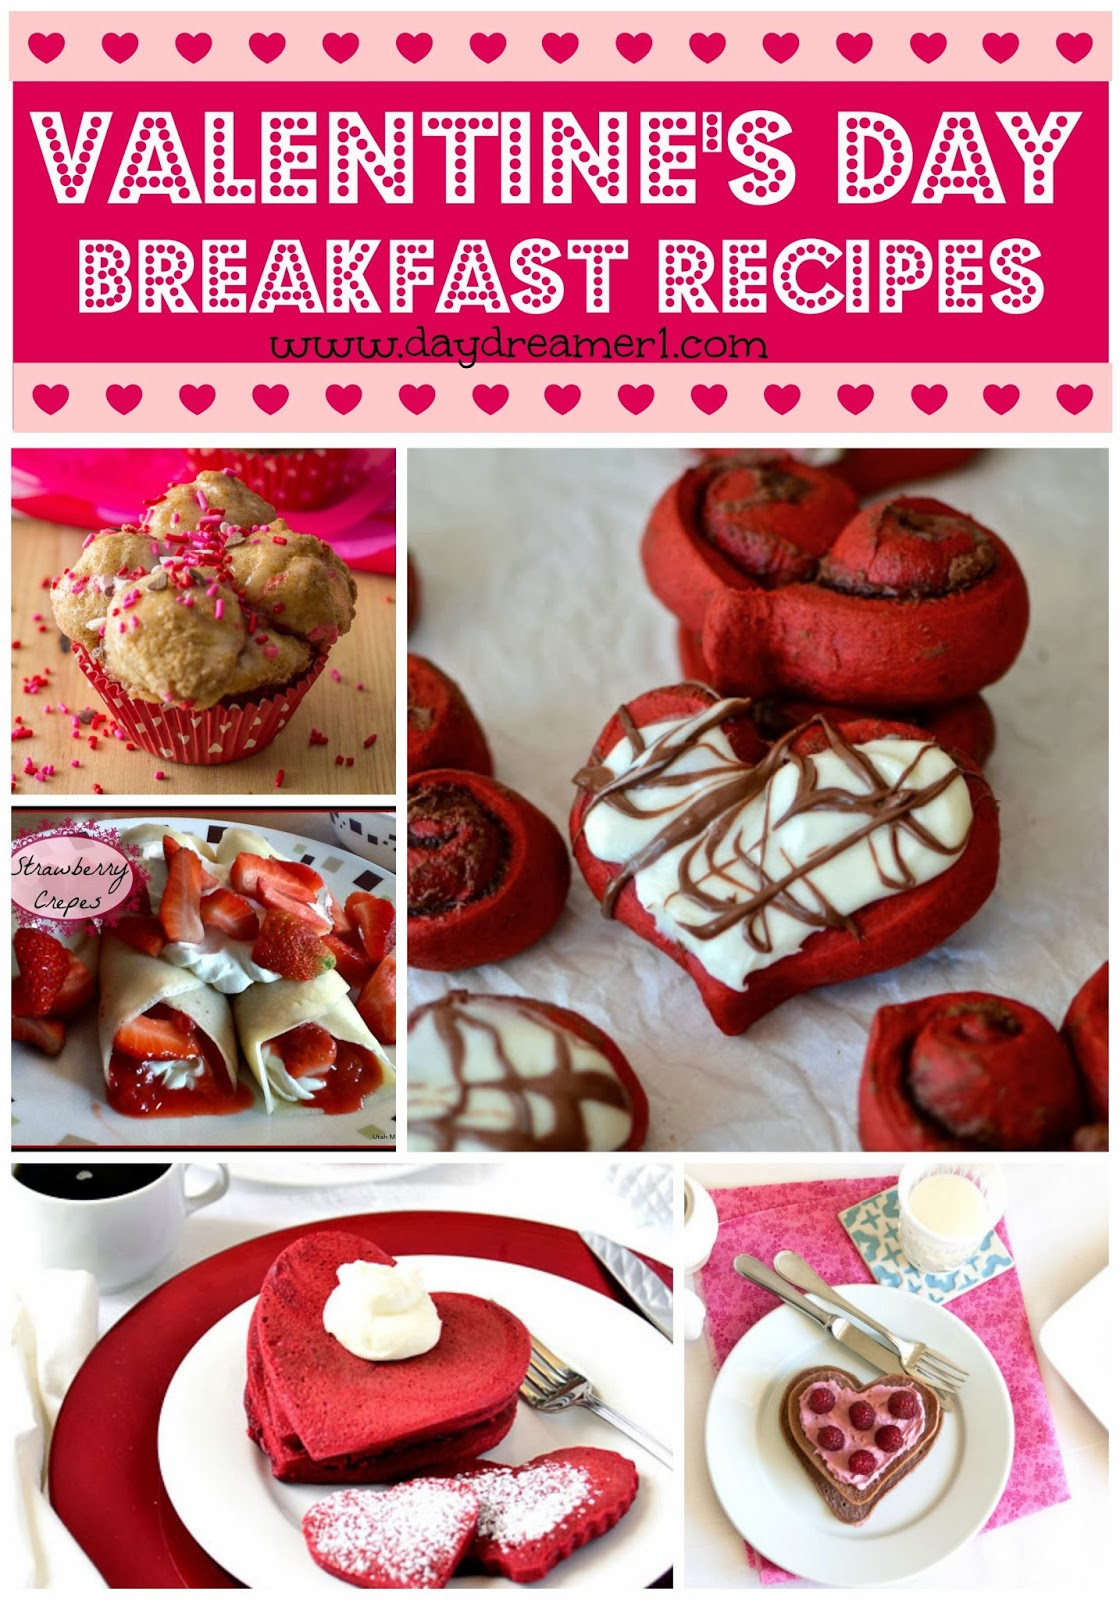 Valentines Day Breakfast Recipe  Breakfast Recipes Valentines Day Day Dreamer